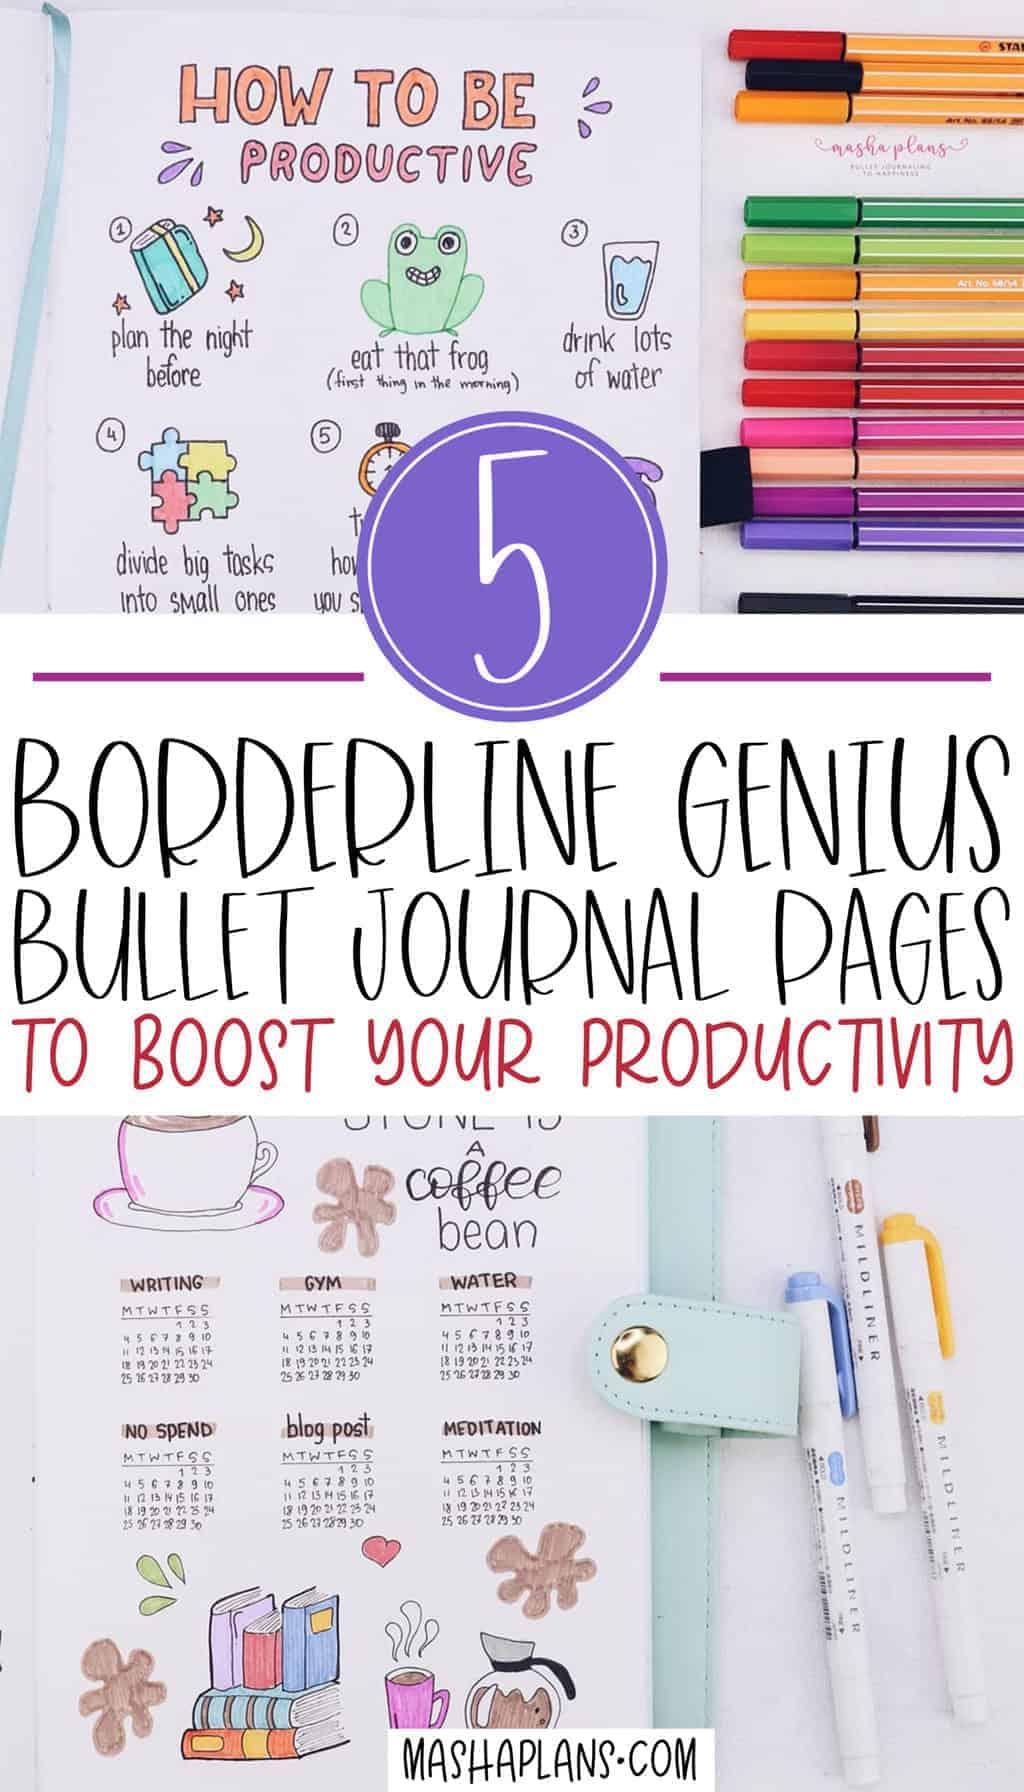 Productivity Bullet Journal Spreads | Masha Plans